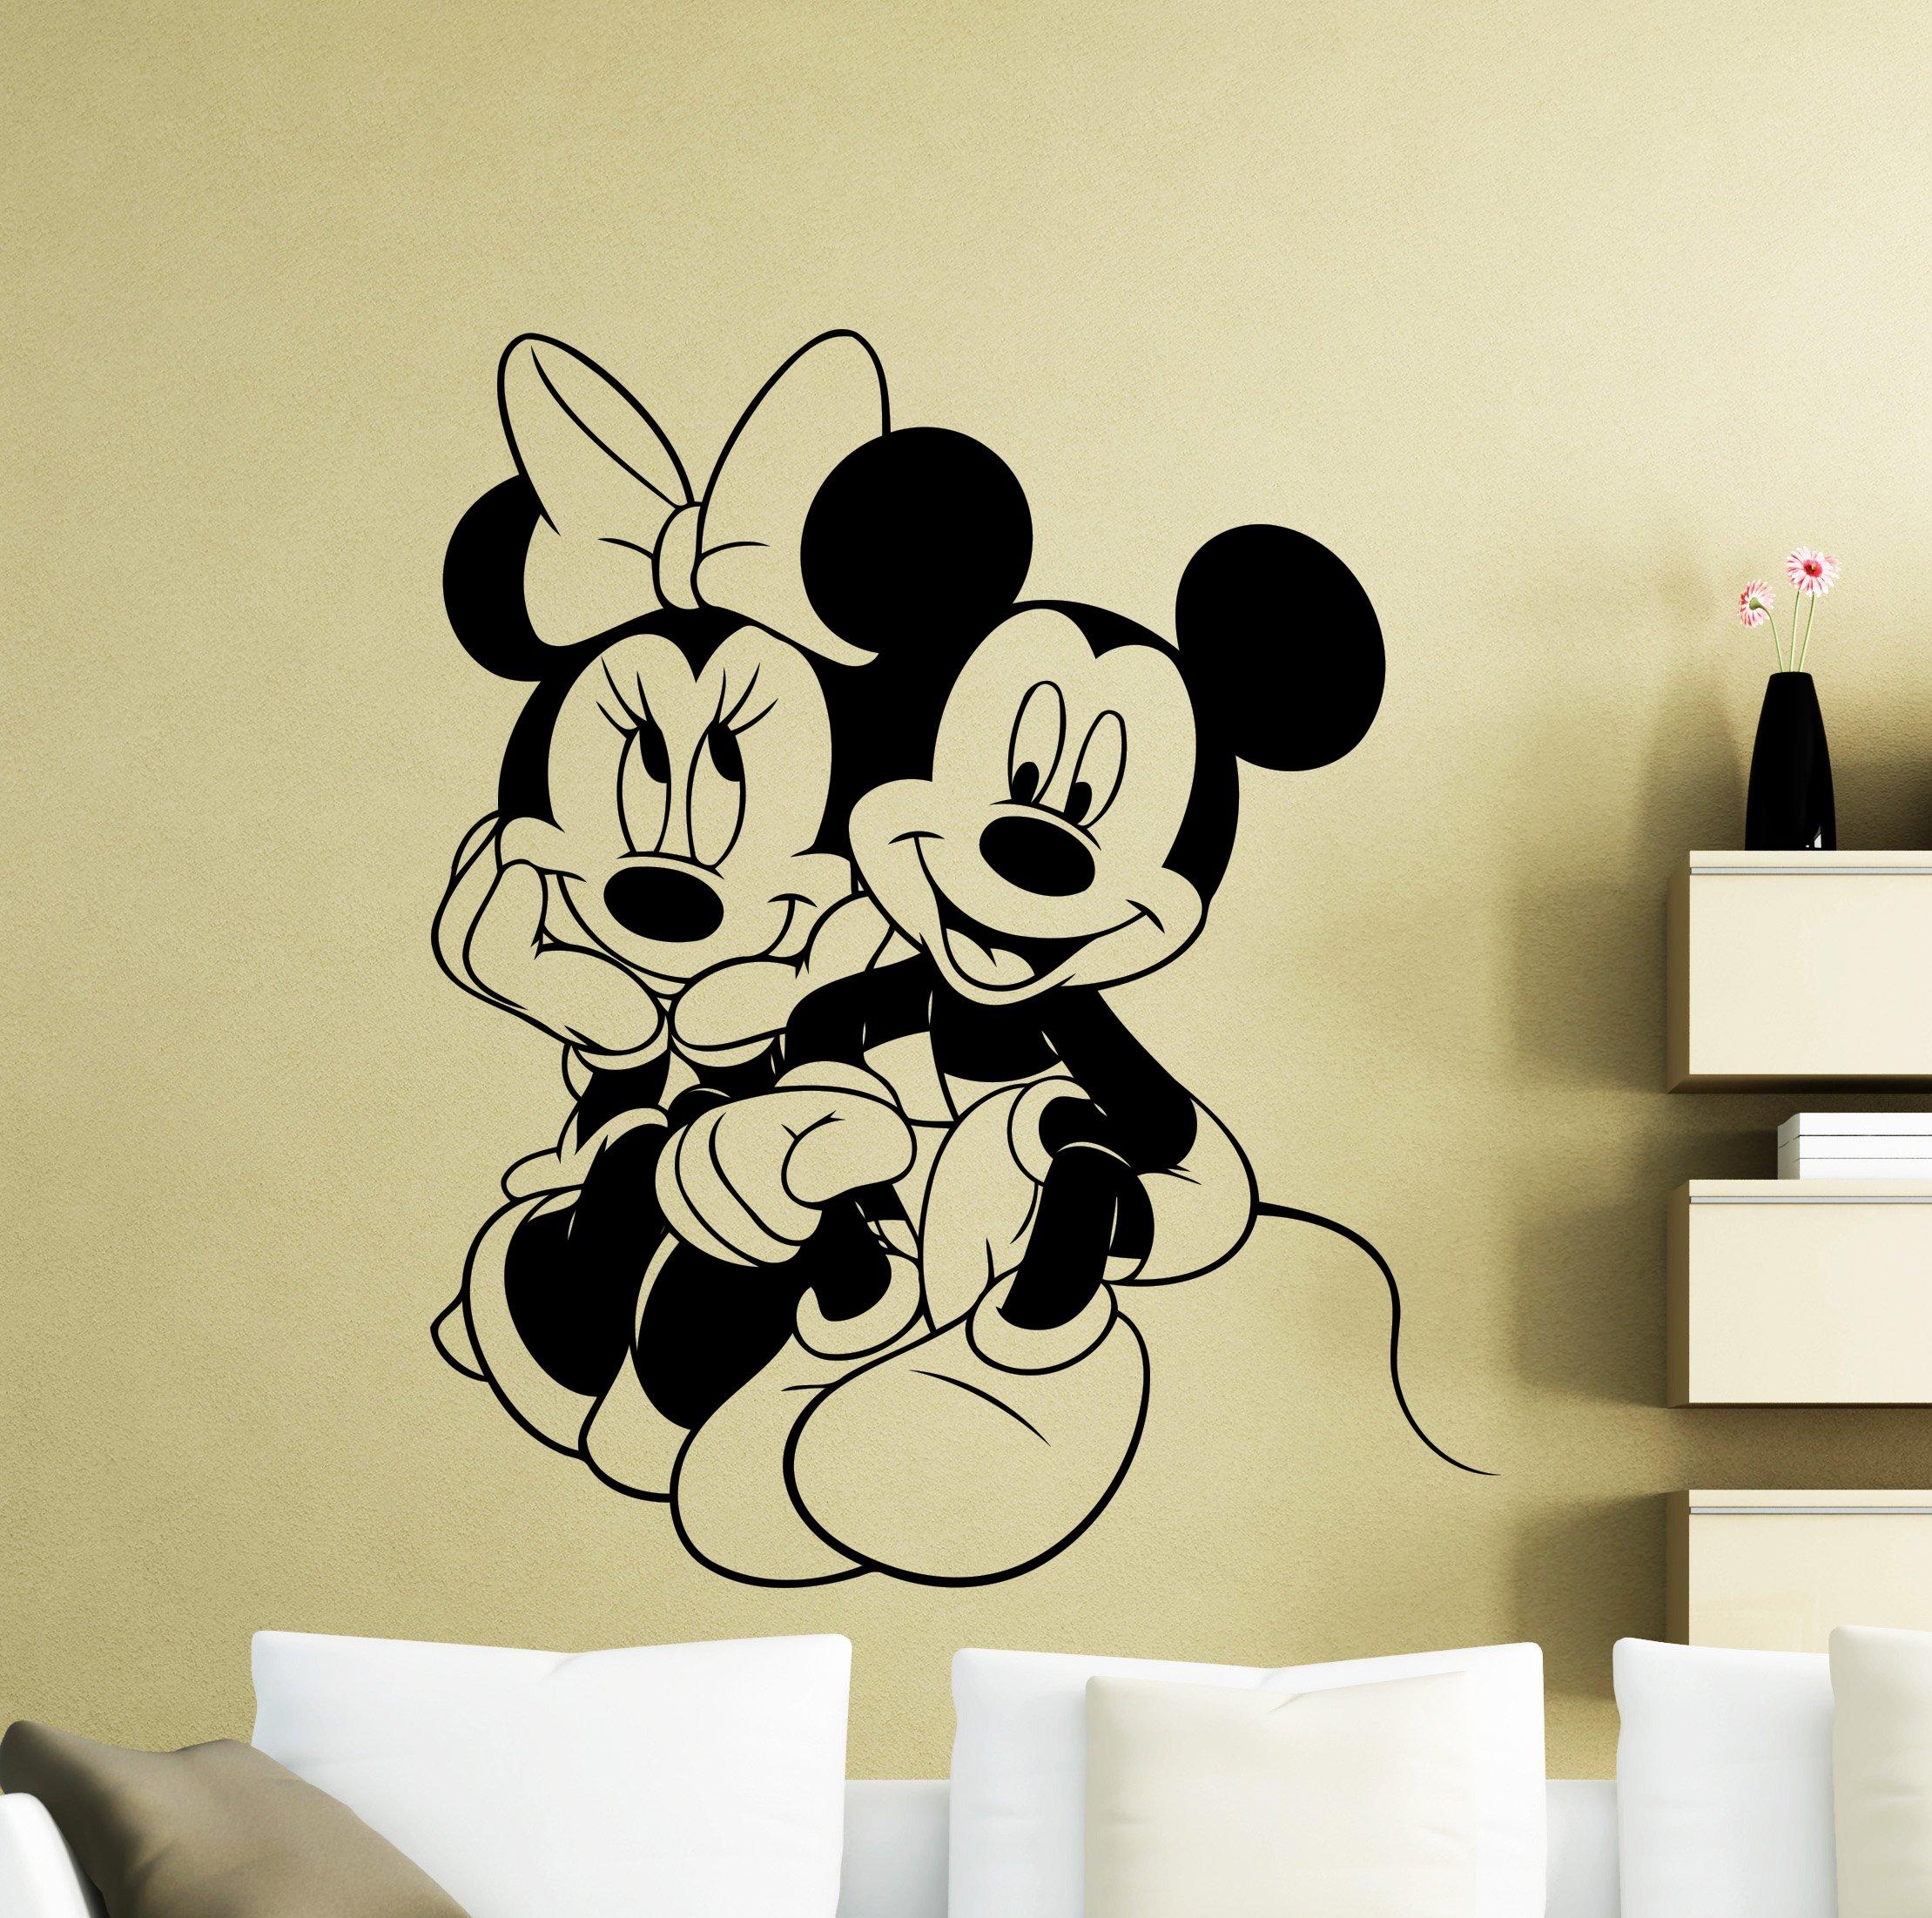 Mickey Mouse Wall Decal Cartoon Disney Vinyl Sticker Home Nursery Room Interior Art Decoration Any Kids Girl Boy Room Mural Waterproof Vinyl Sticker (396xx)